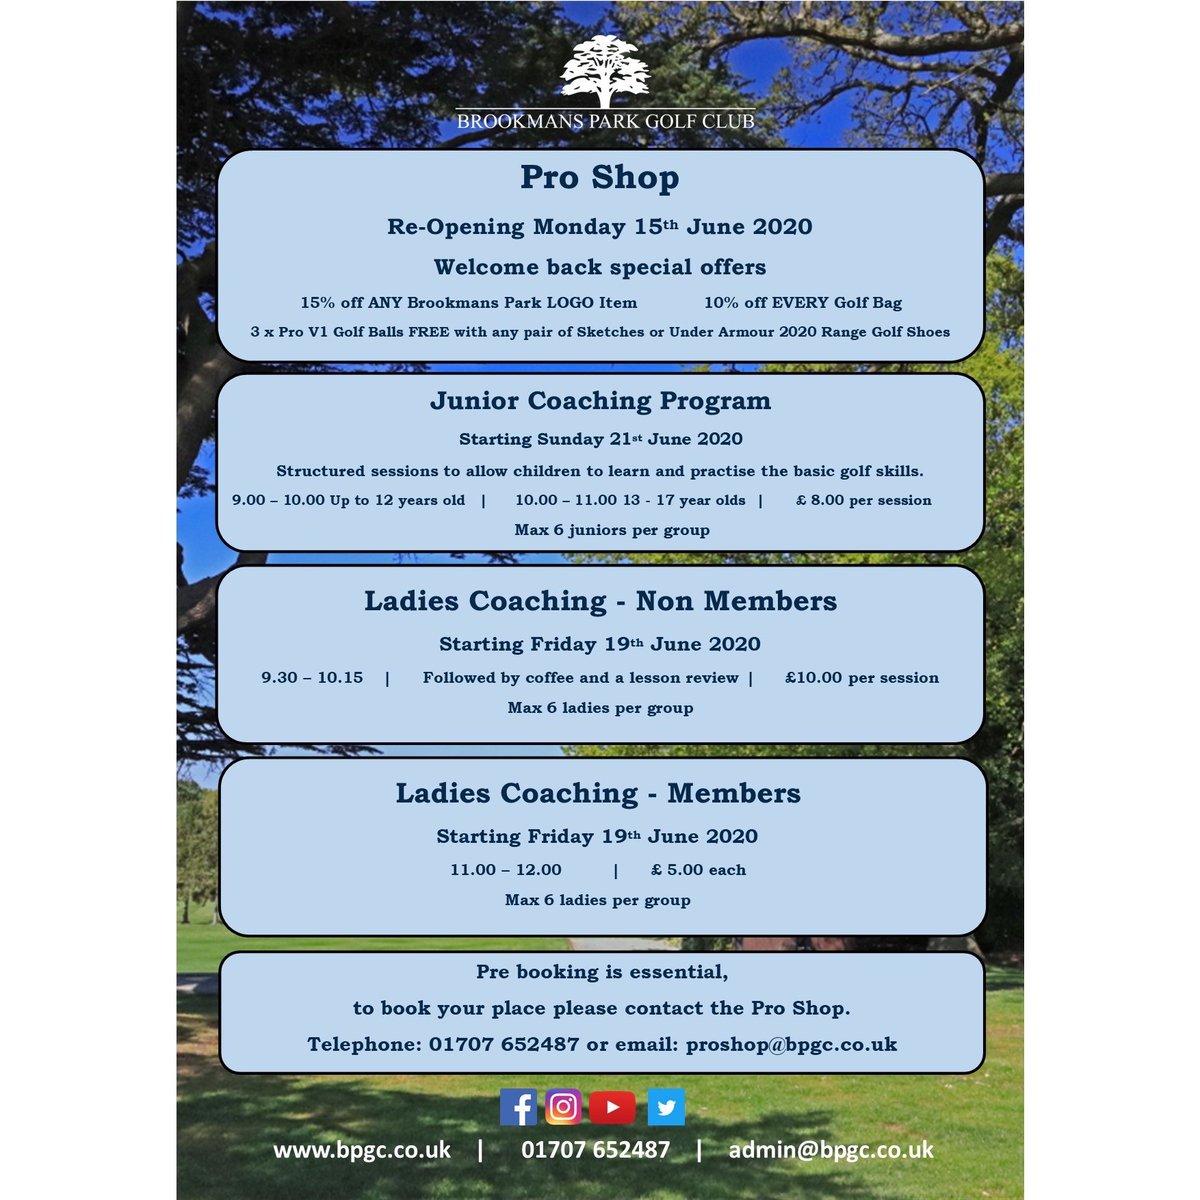 For information regarding Golf Lessons, please get in touch today. Email: proshop@bpgc.co.uk or call: 01707652487 #brookmansparkgolfclub #golflessons #juniorgolf #newbeginnings #golf #golfingpic.twitter.com/TJrmzWOXGR